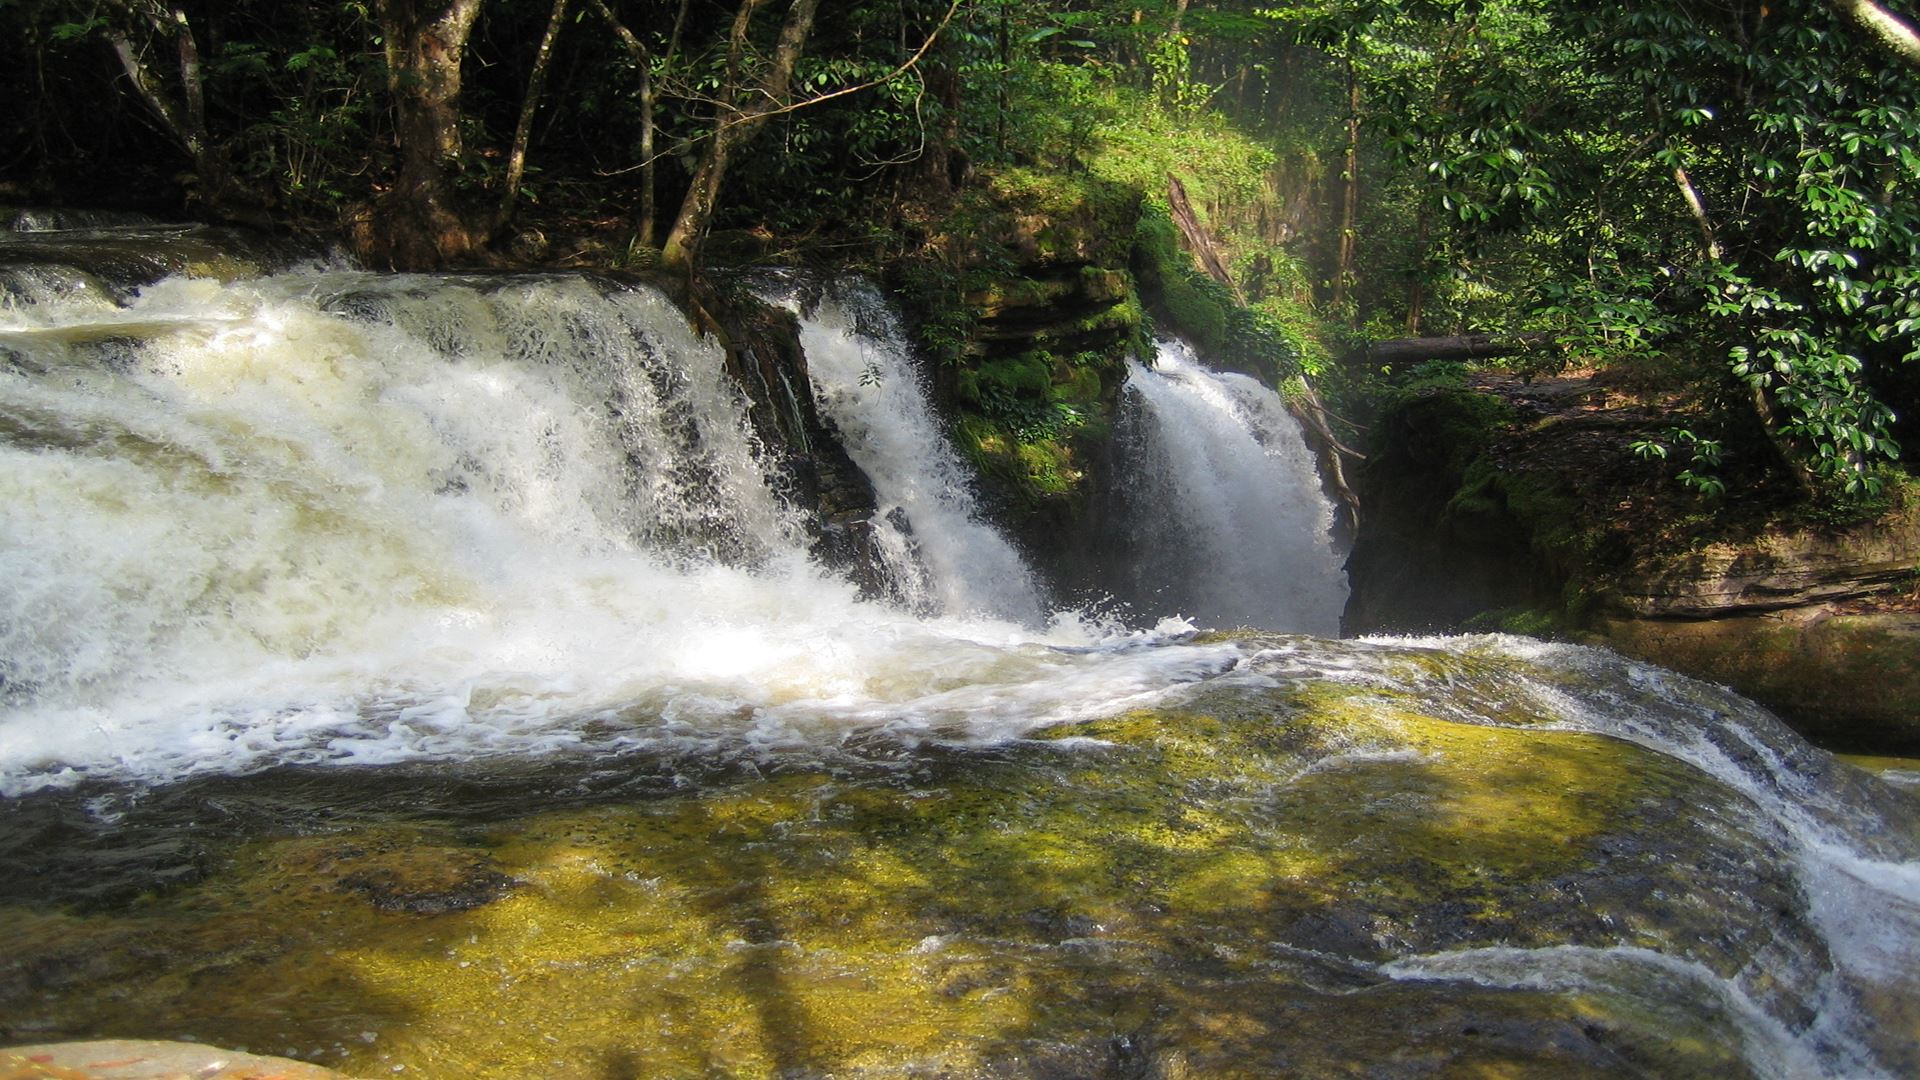 PRESIDENTE FIGUEIREDO WATERFALLS